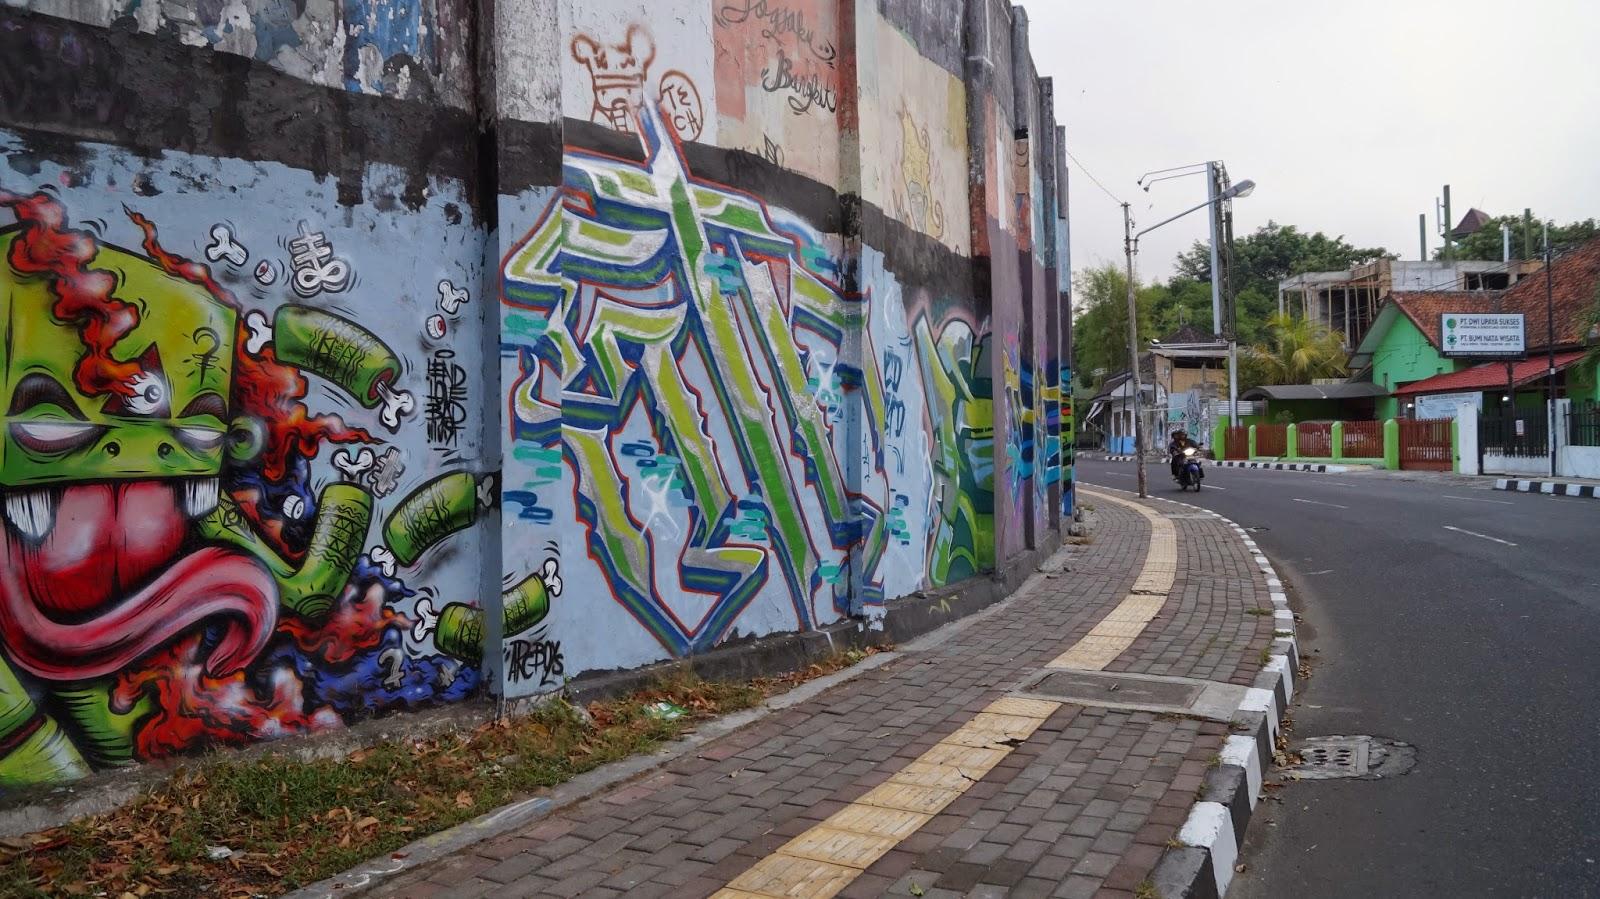 The surrounding area kondisi sekitar graffiti